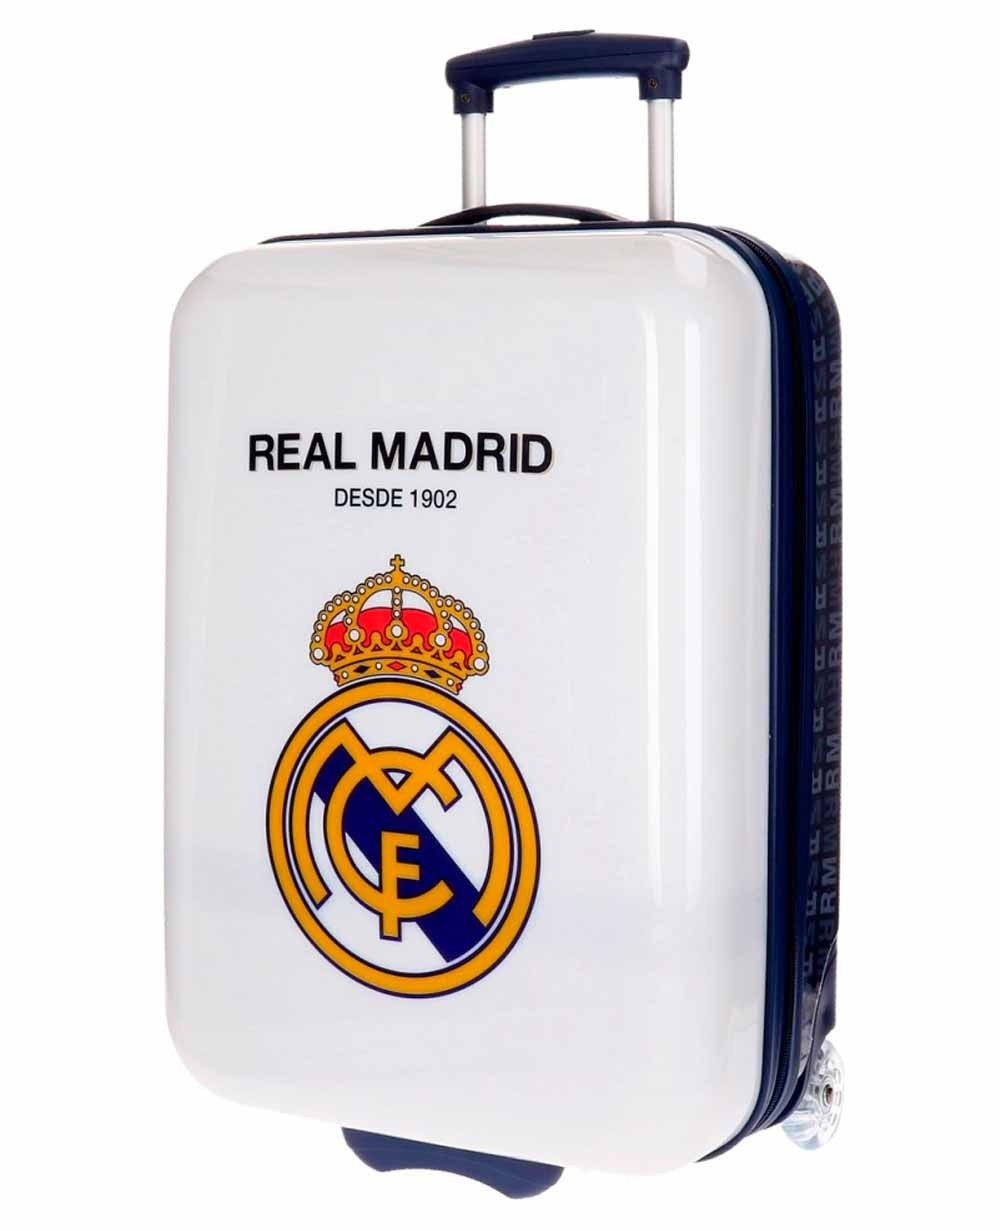 Real Madrid Hala Madrid Maleta de mano Blanca